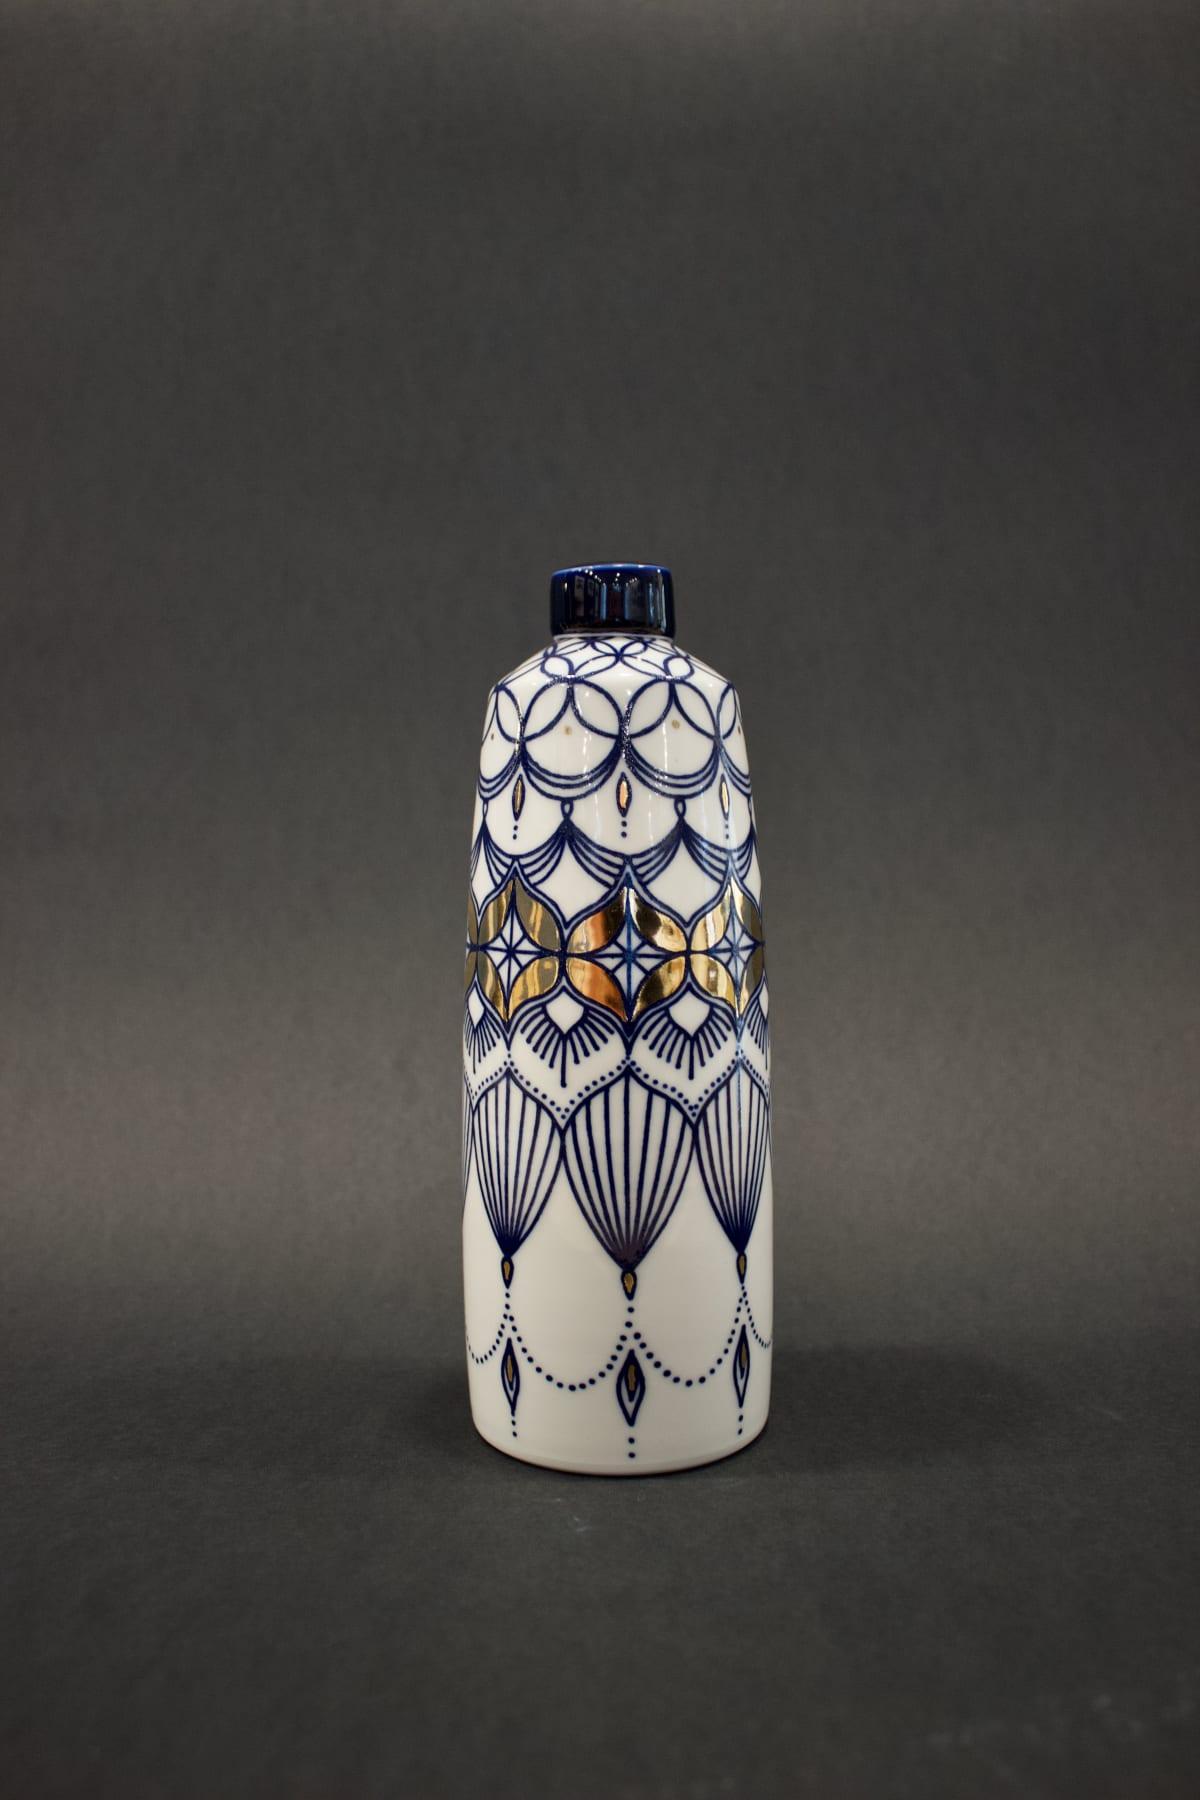 Rhian Malin Large Straight Sided Mandala Ginger Jar, 2019 Porcelain 21 x 8 x 8 cm 8 1/4 x 3 1/8 x 3 1/8 in